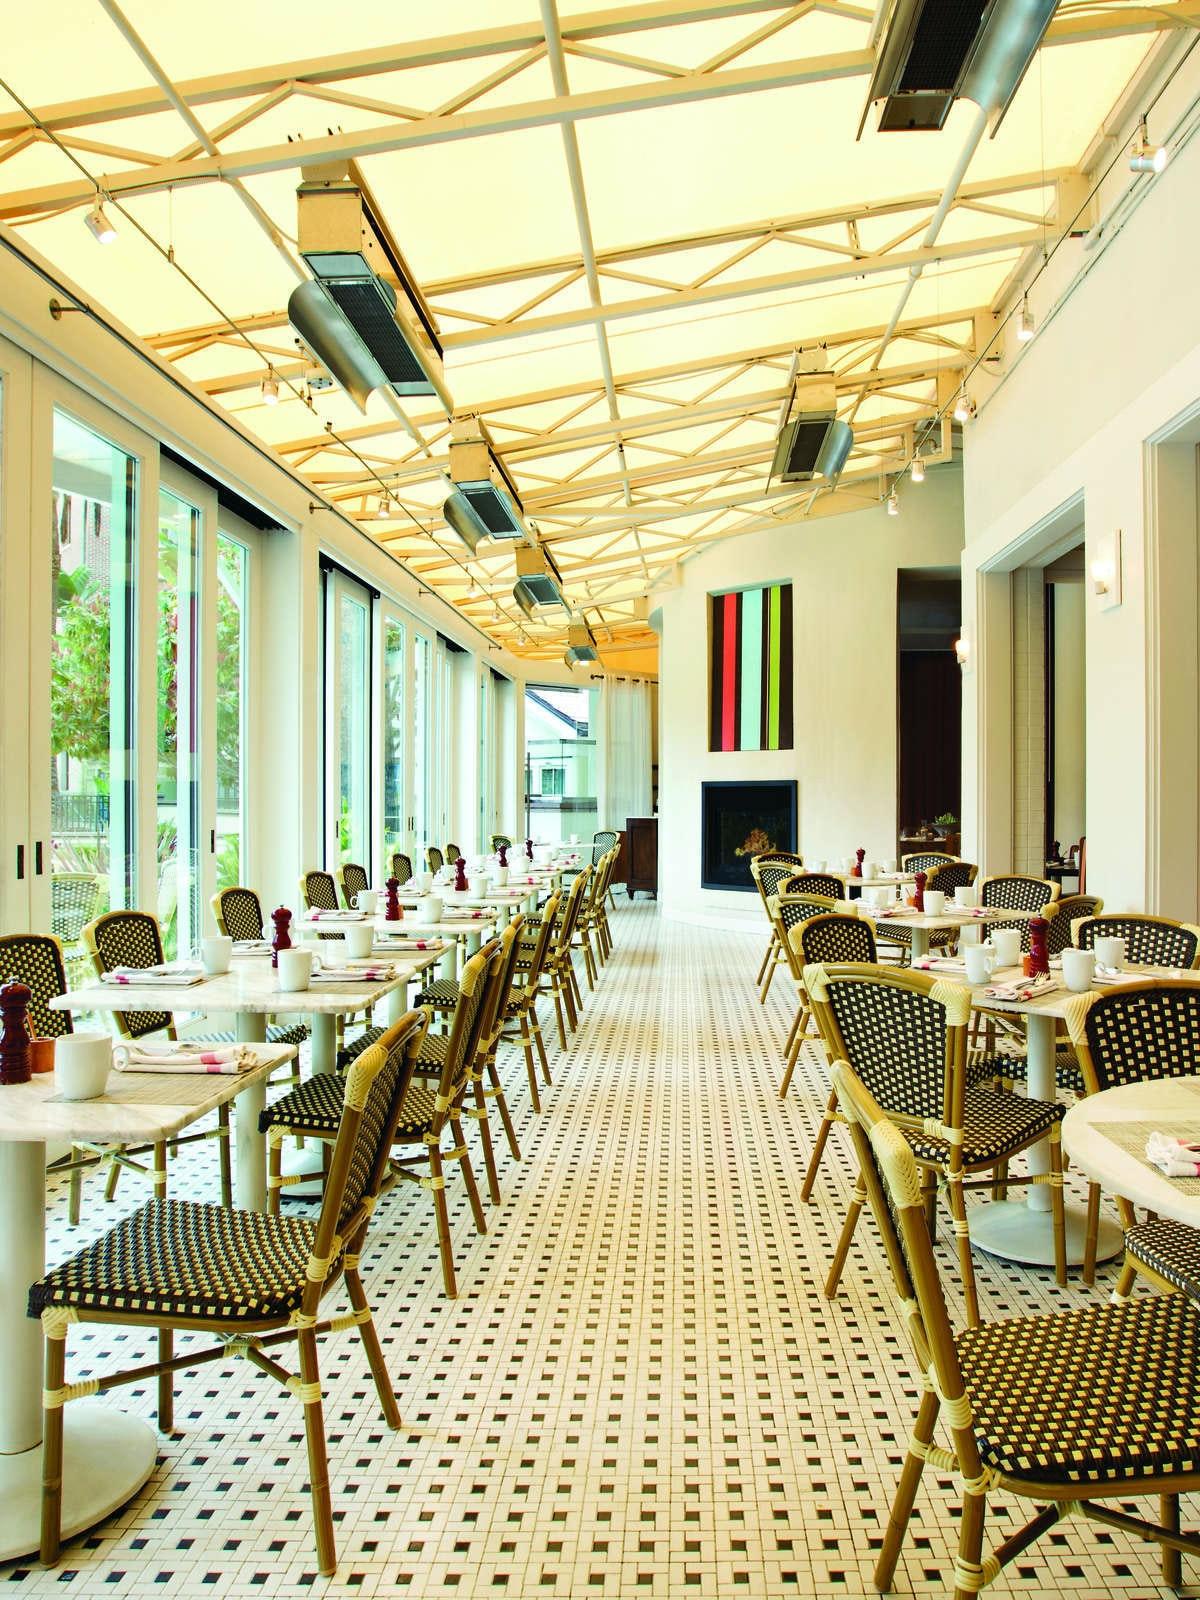 Fairmont Miramar Hotel & Bungalows HBSi